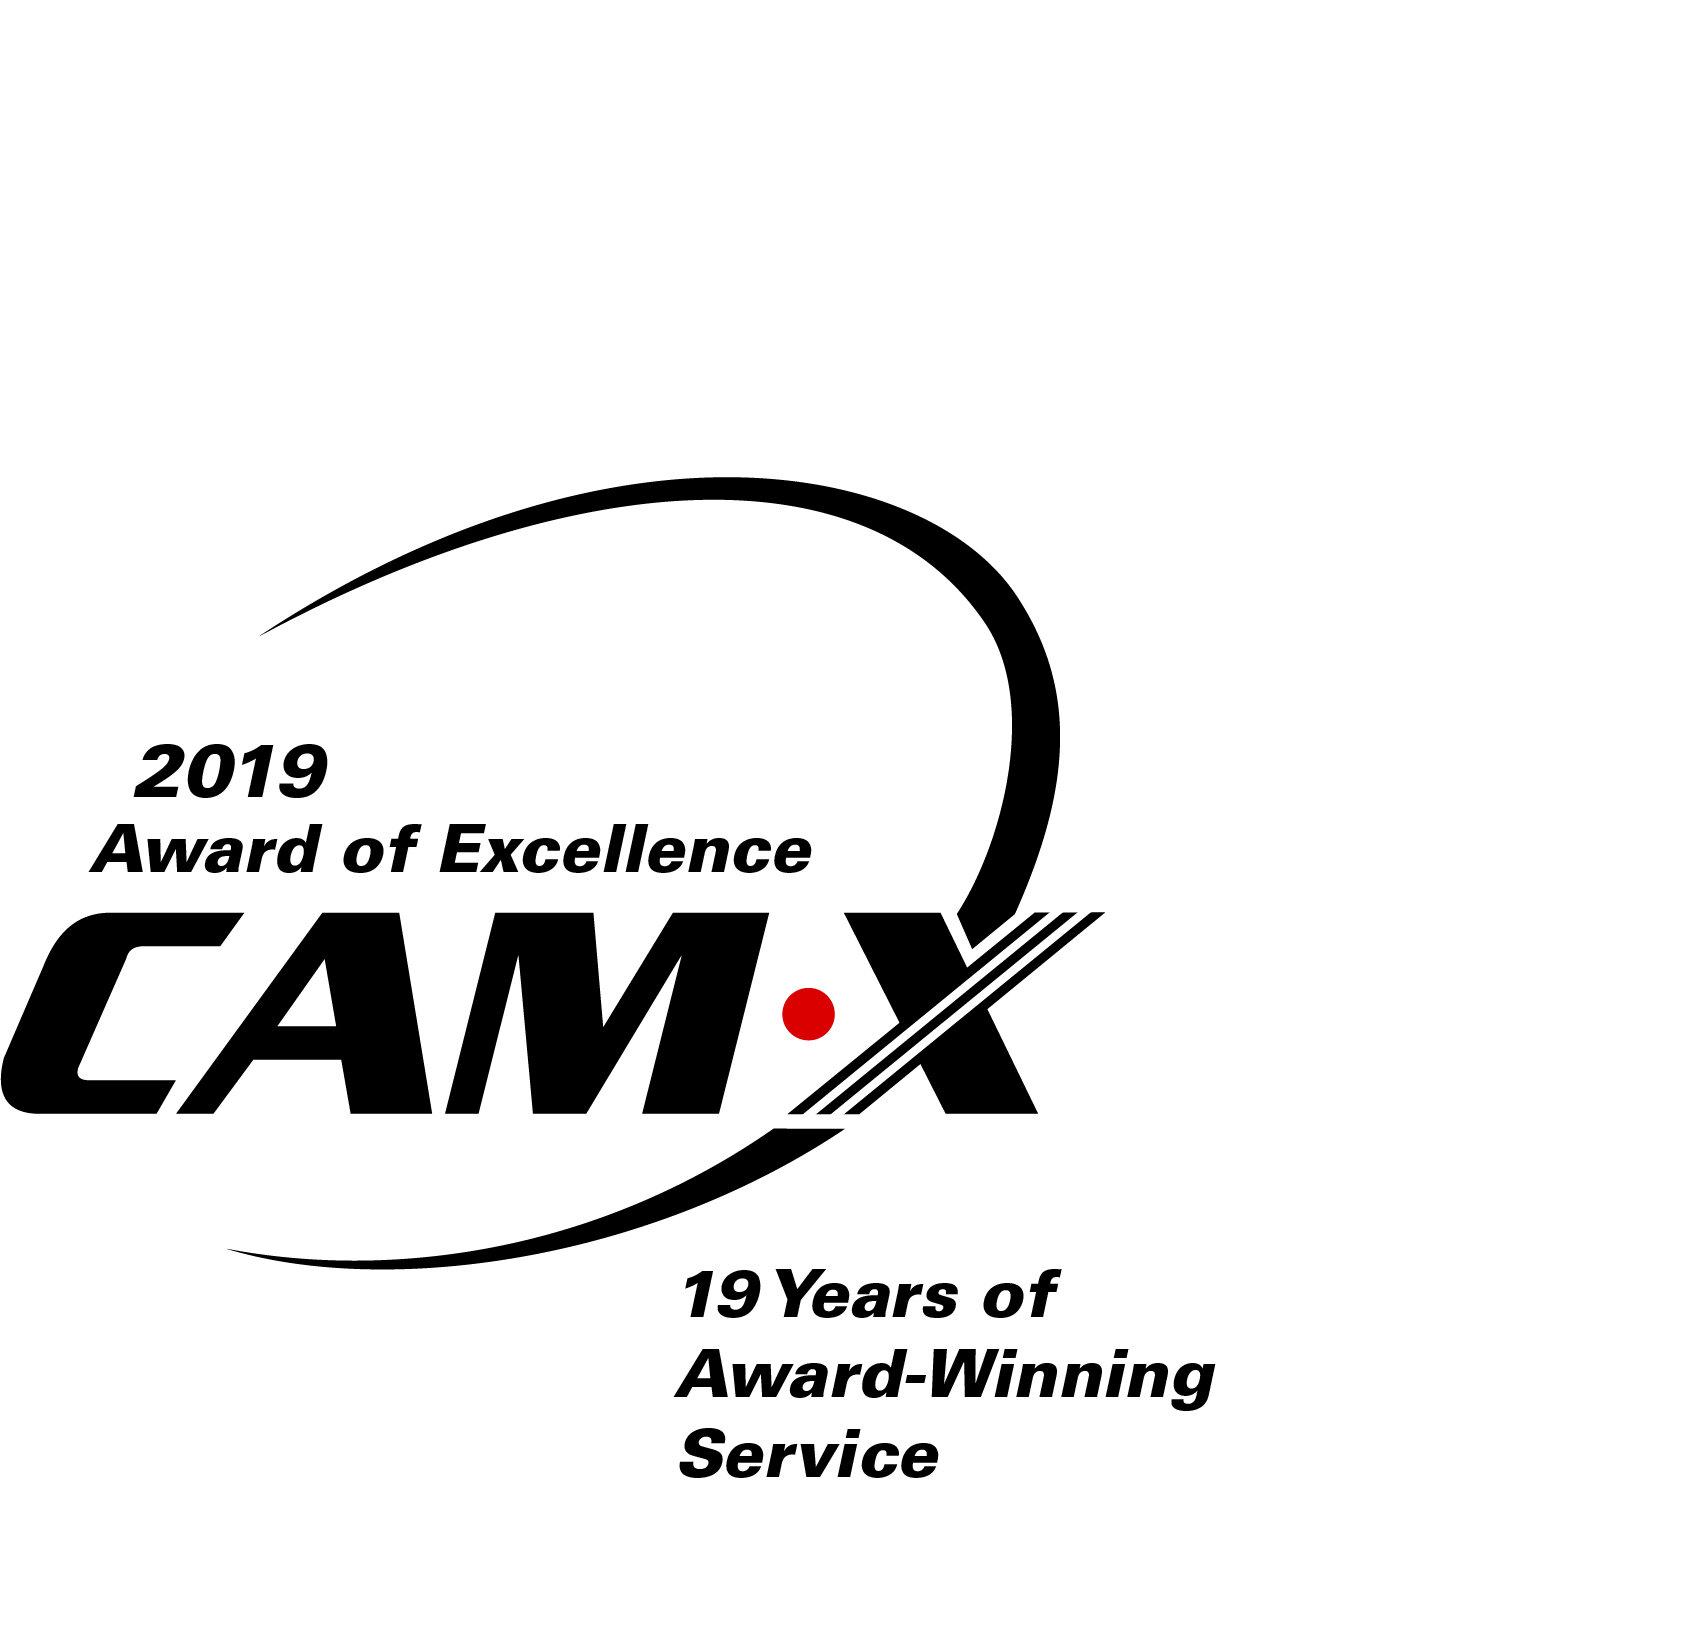 CAM_X_AOE Year 19 2019.jpg